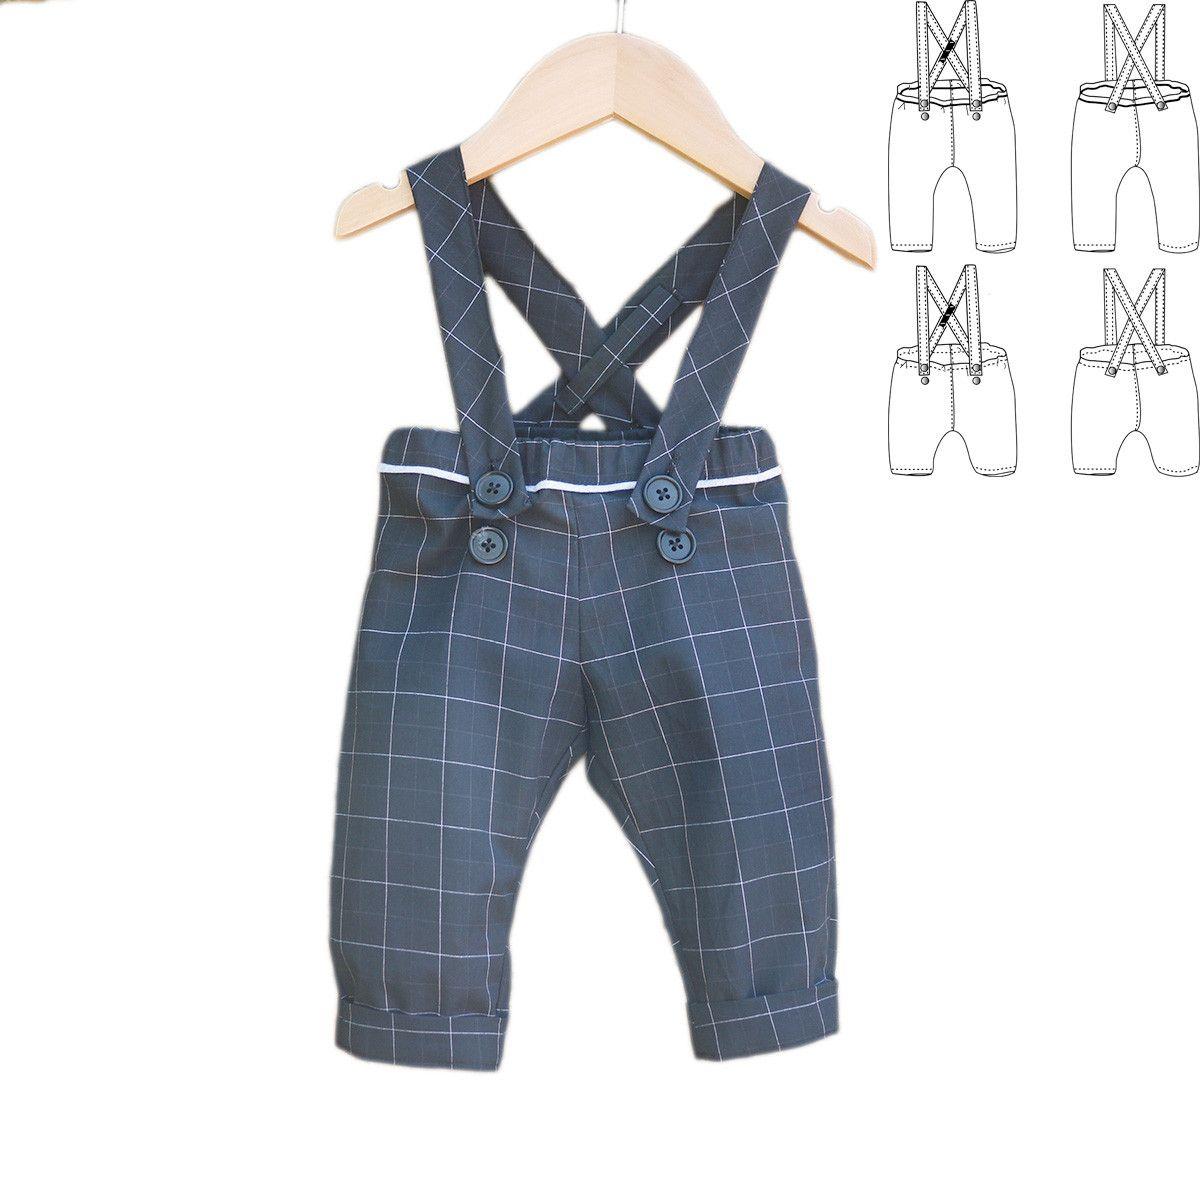 b2b3d066db23b Pantalon ou Short à bretelles BRIGHTON PDF 6M-4A | Patrons de ...